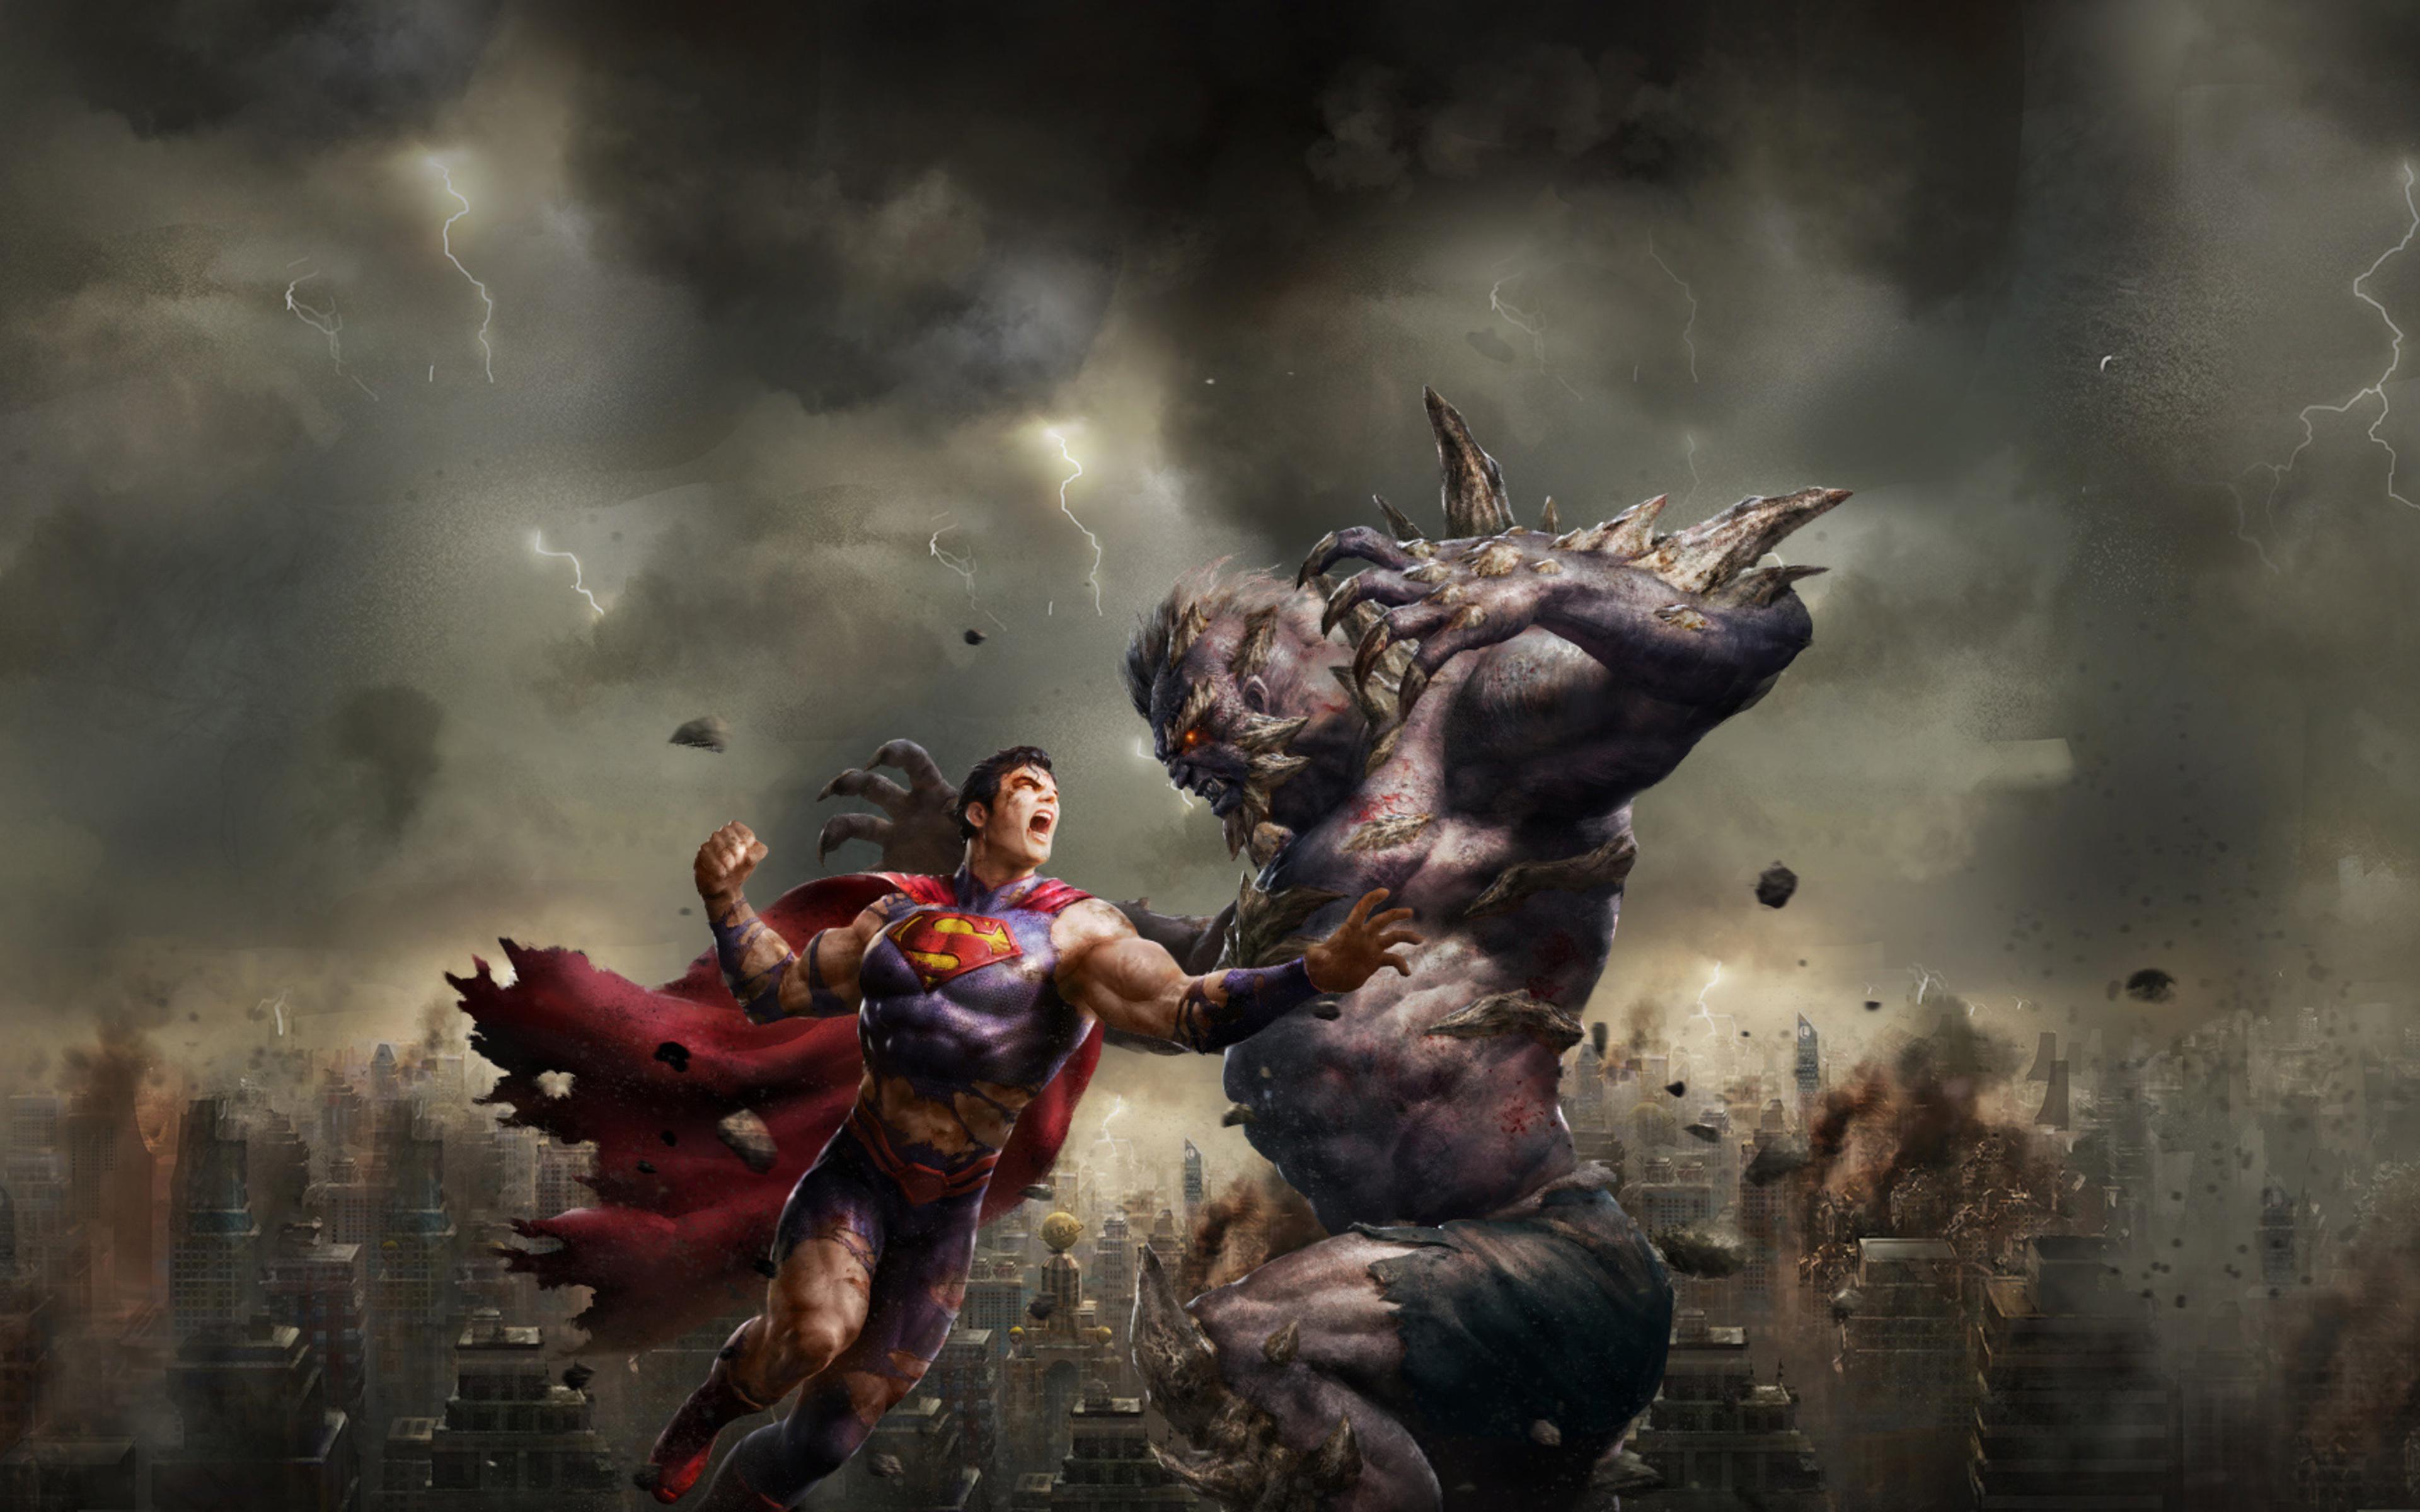 superman-and-demon-art-l7.jpg